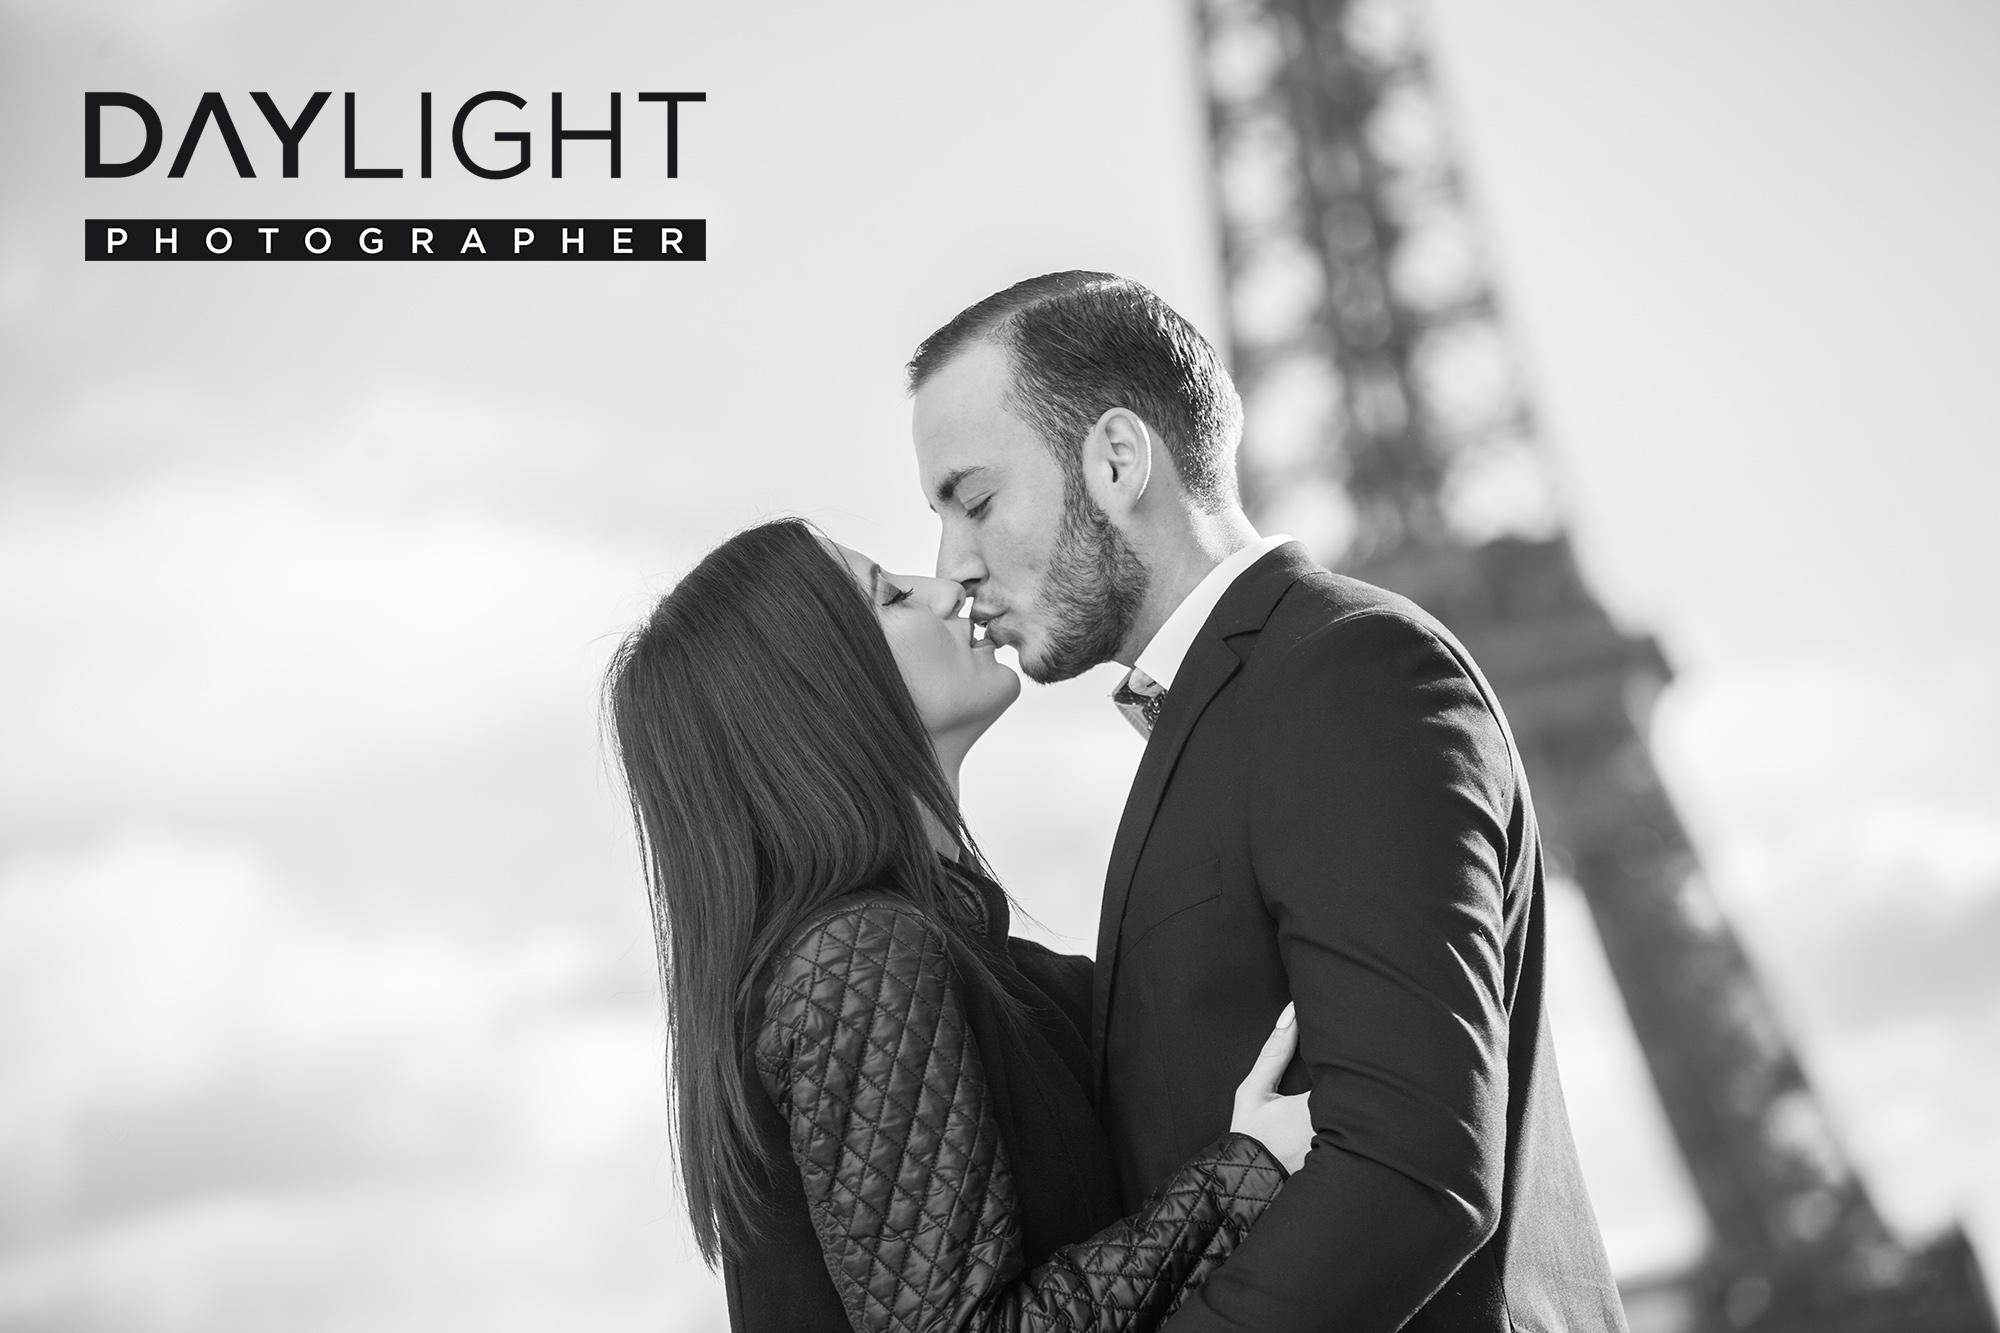 daylight photographer_fotoshooting-paris-fotograf-buchen